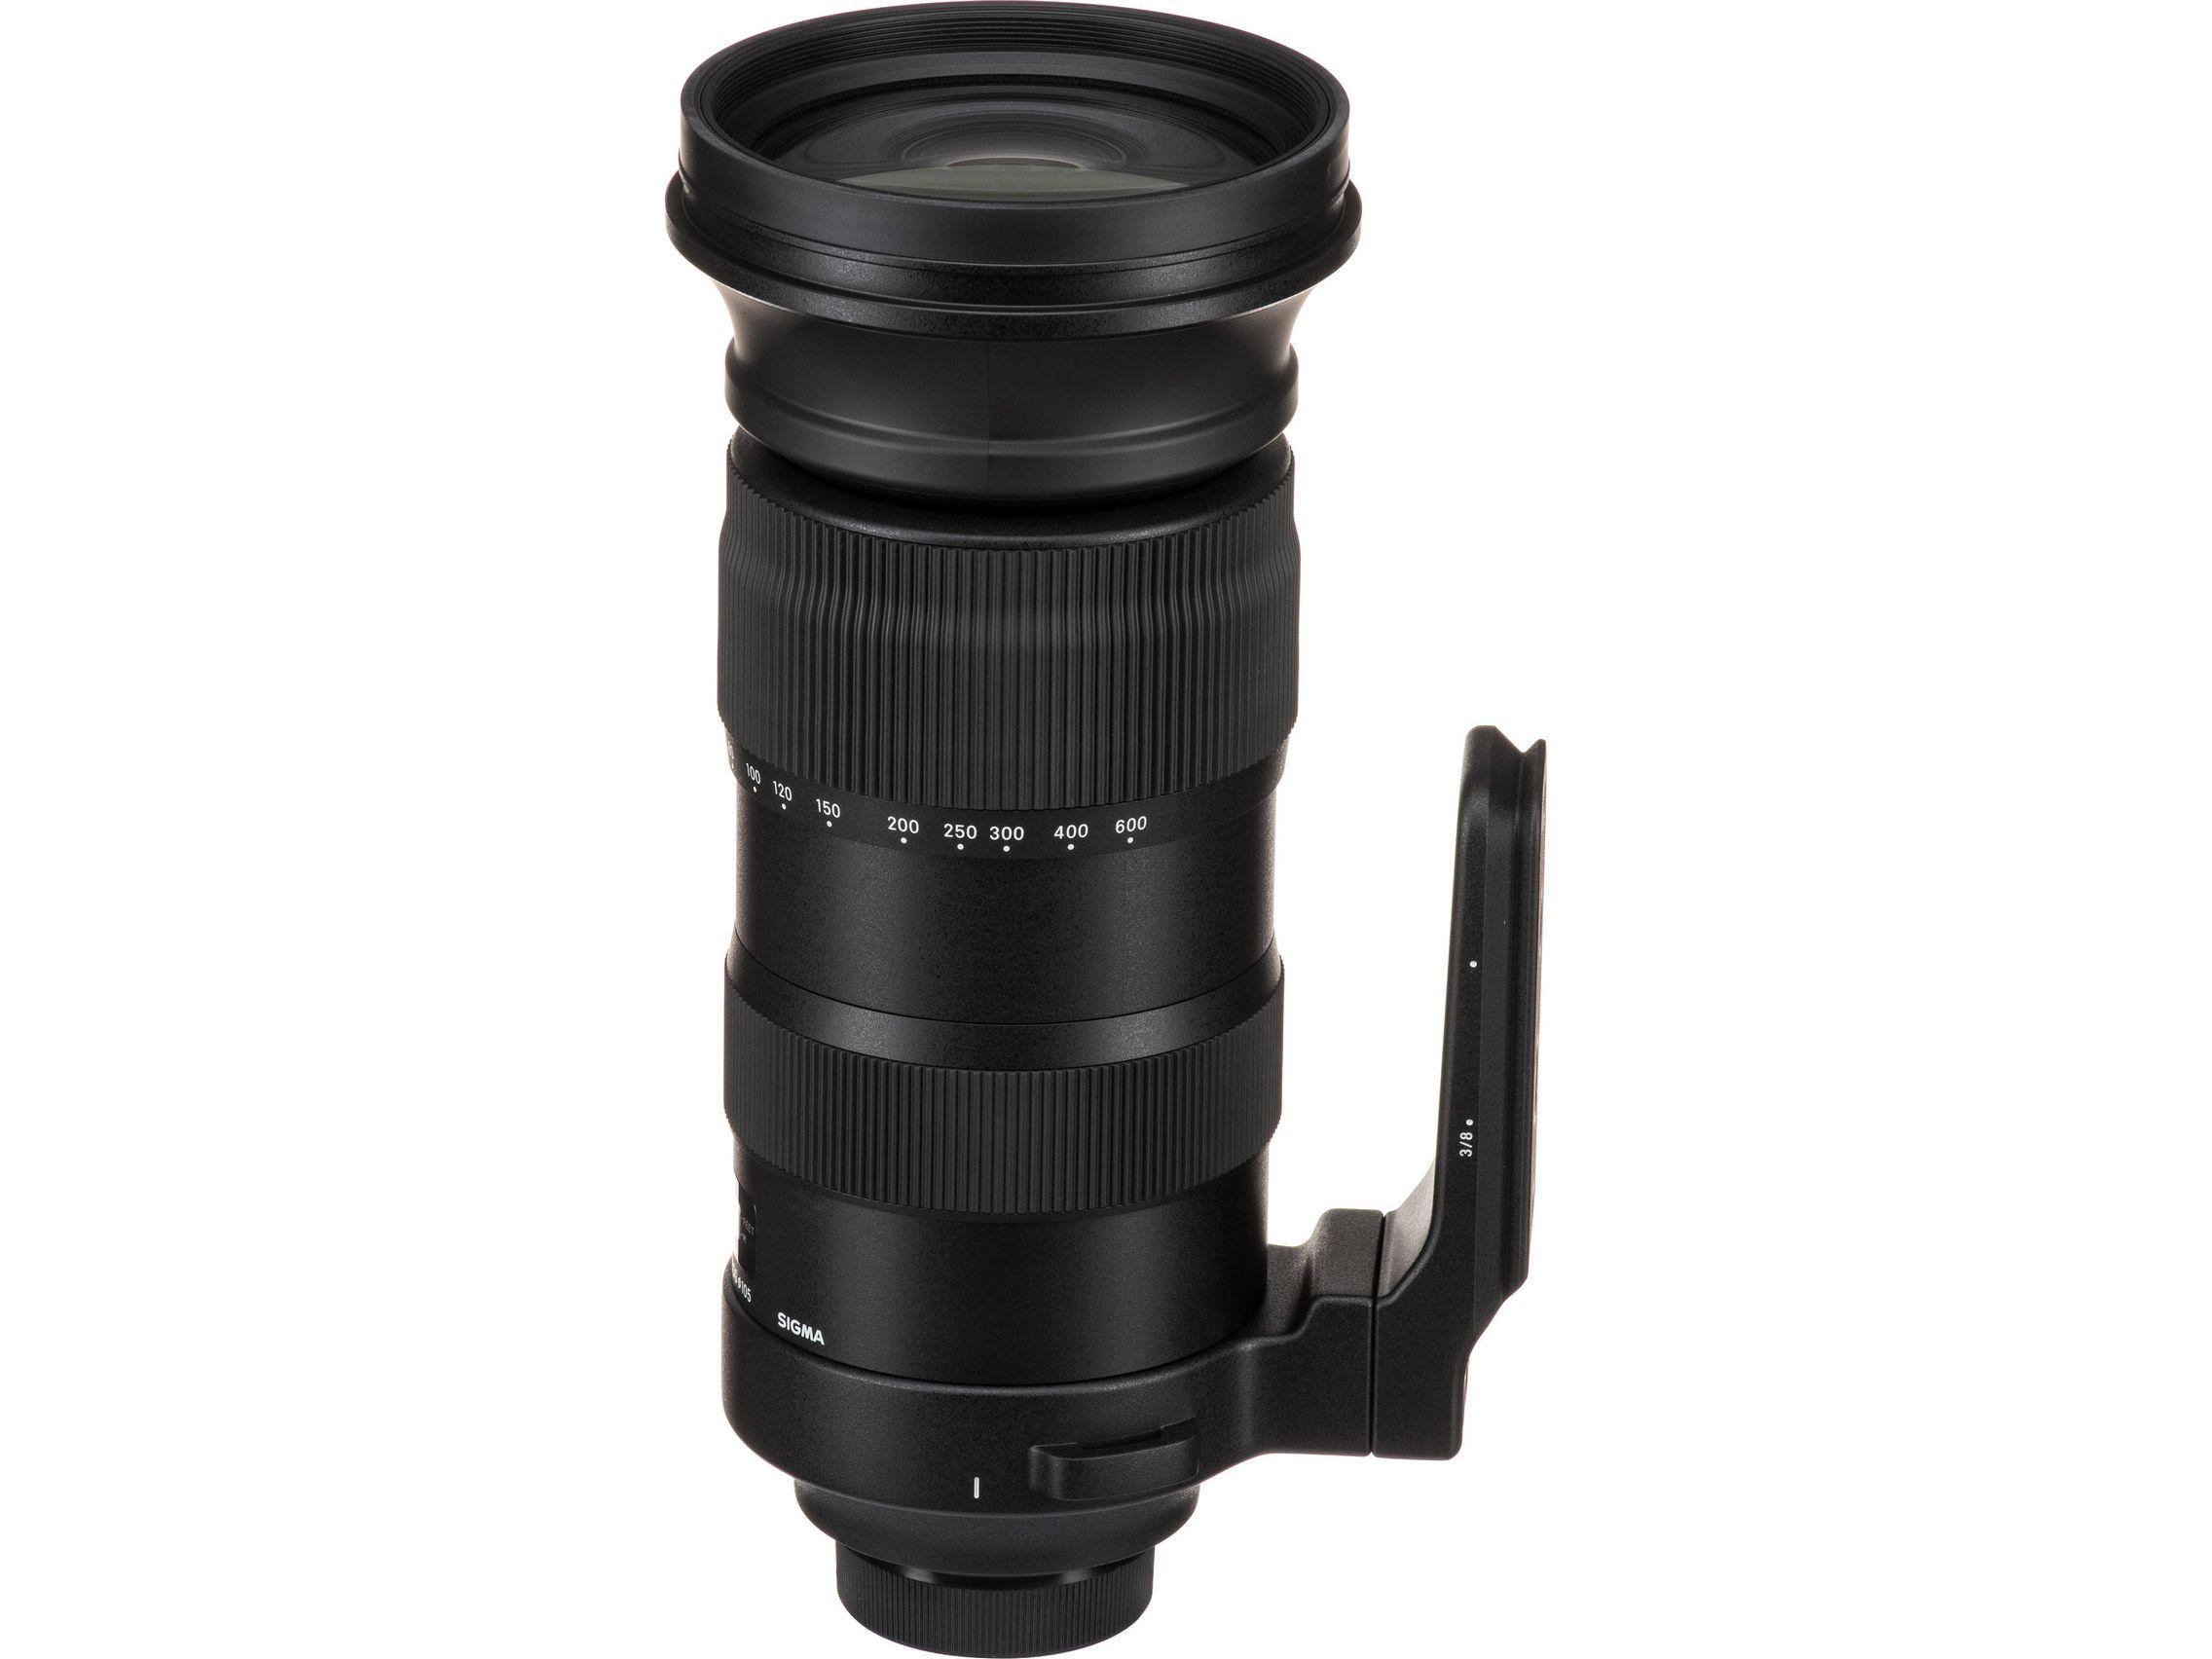 Sigma 60-600mm 1:4.5-6.3 DG S (Sport, OS